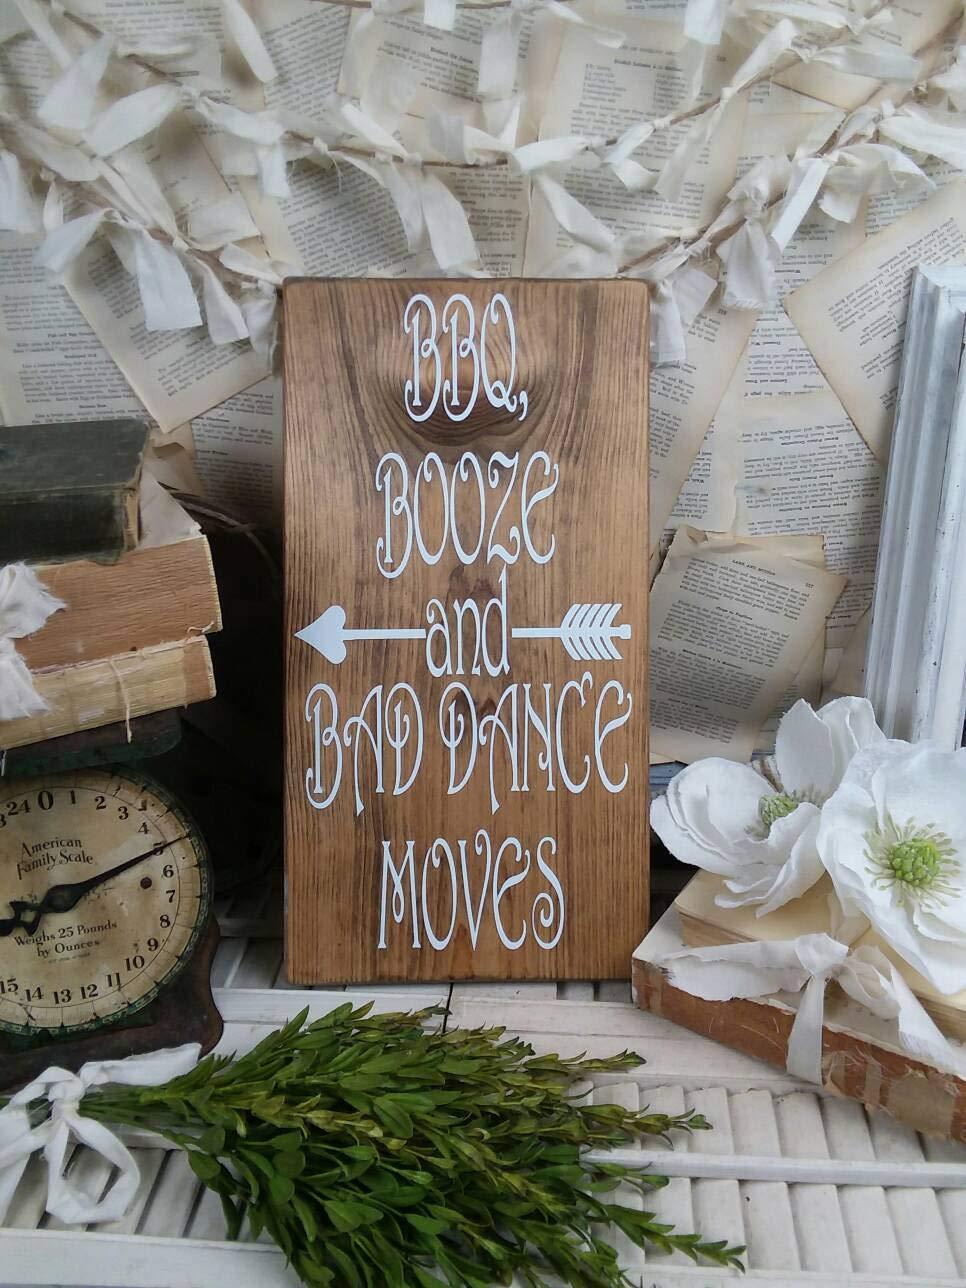 Qui556 - Cartel de Madera con Texto en inglés Bad Dance ...